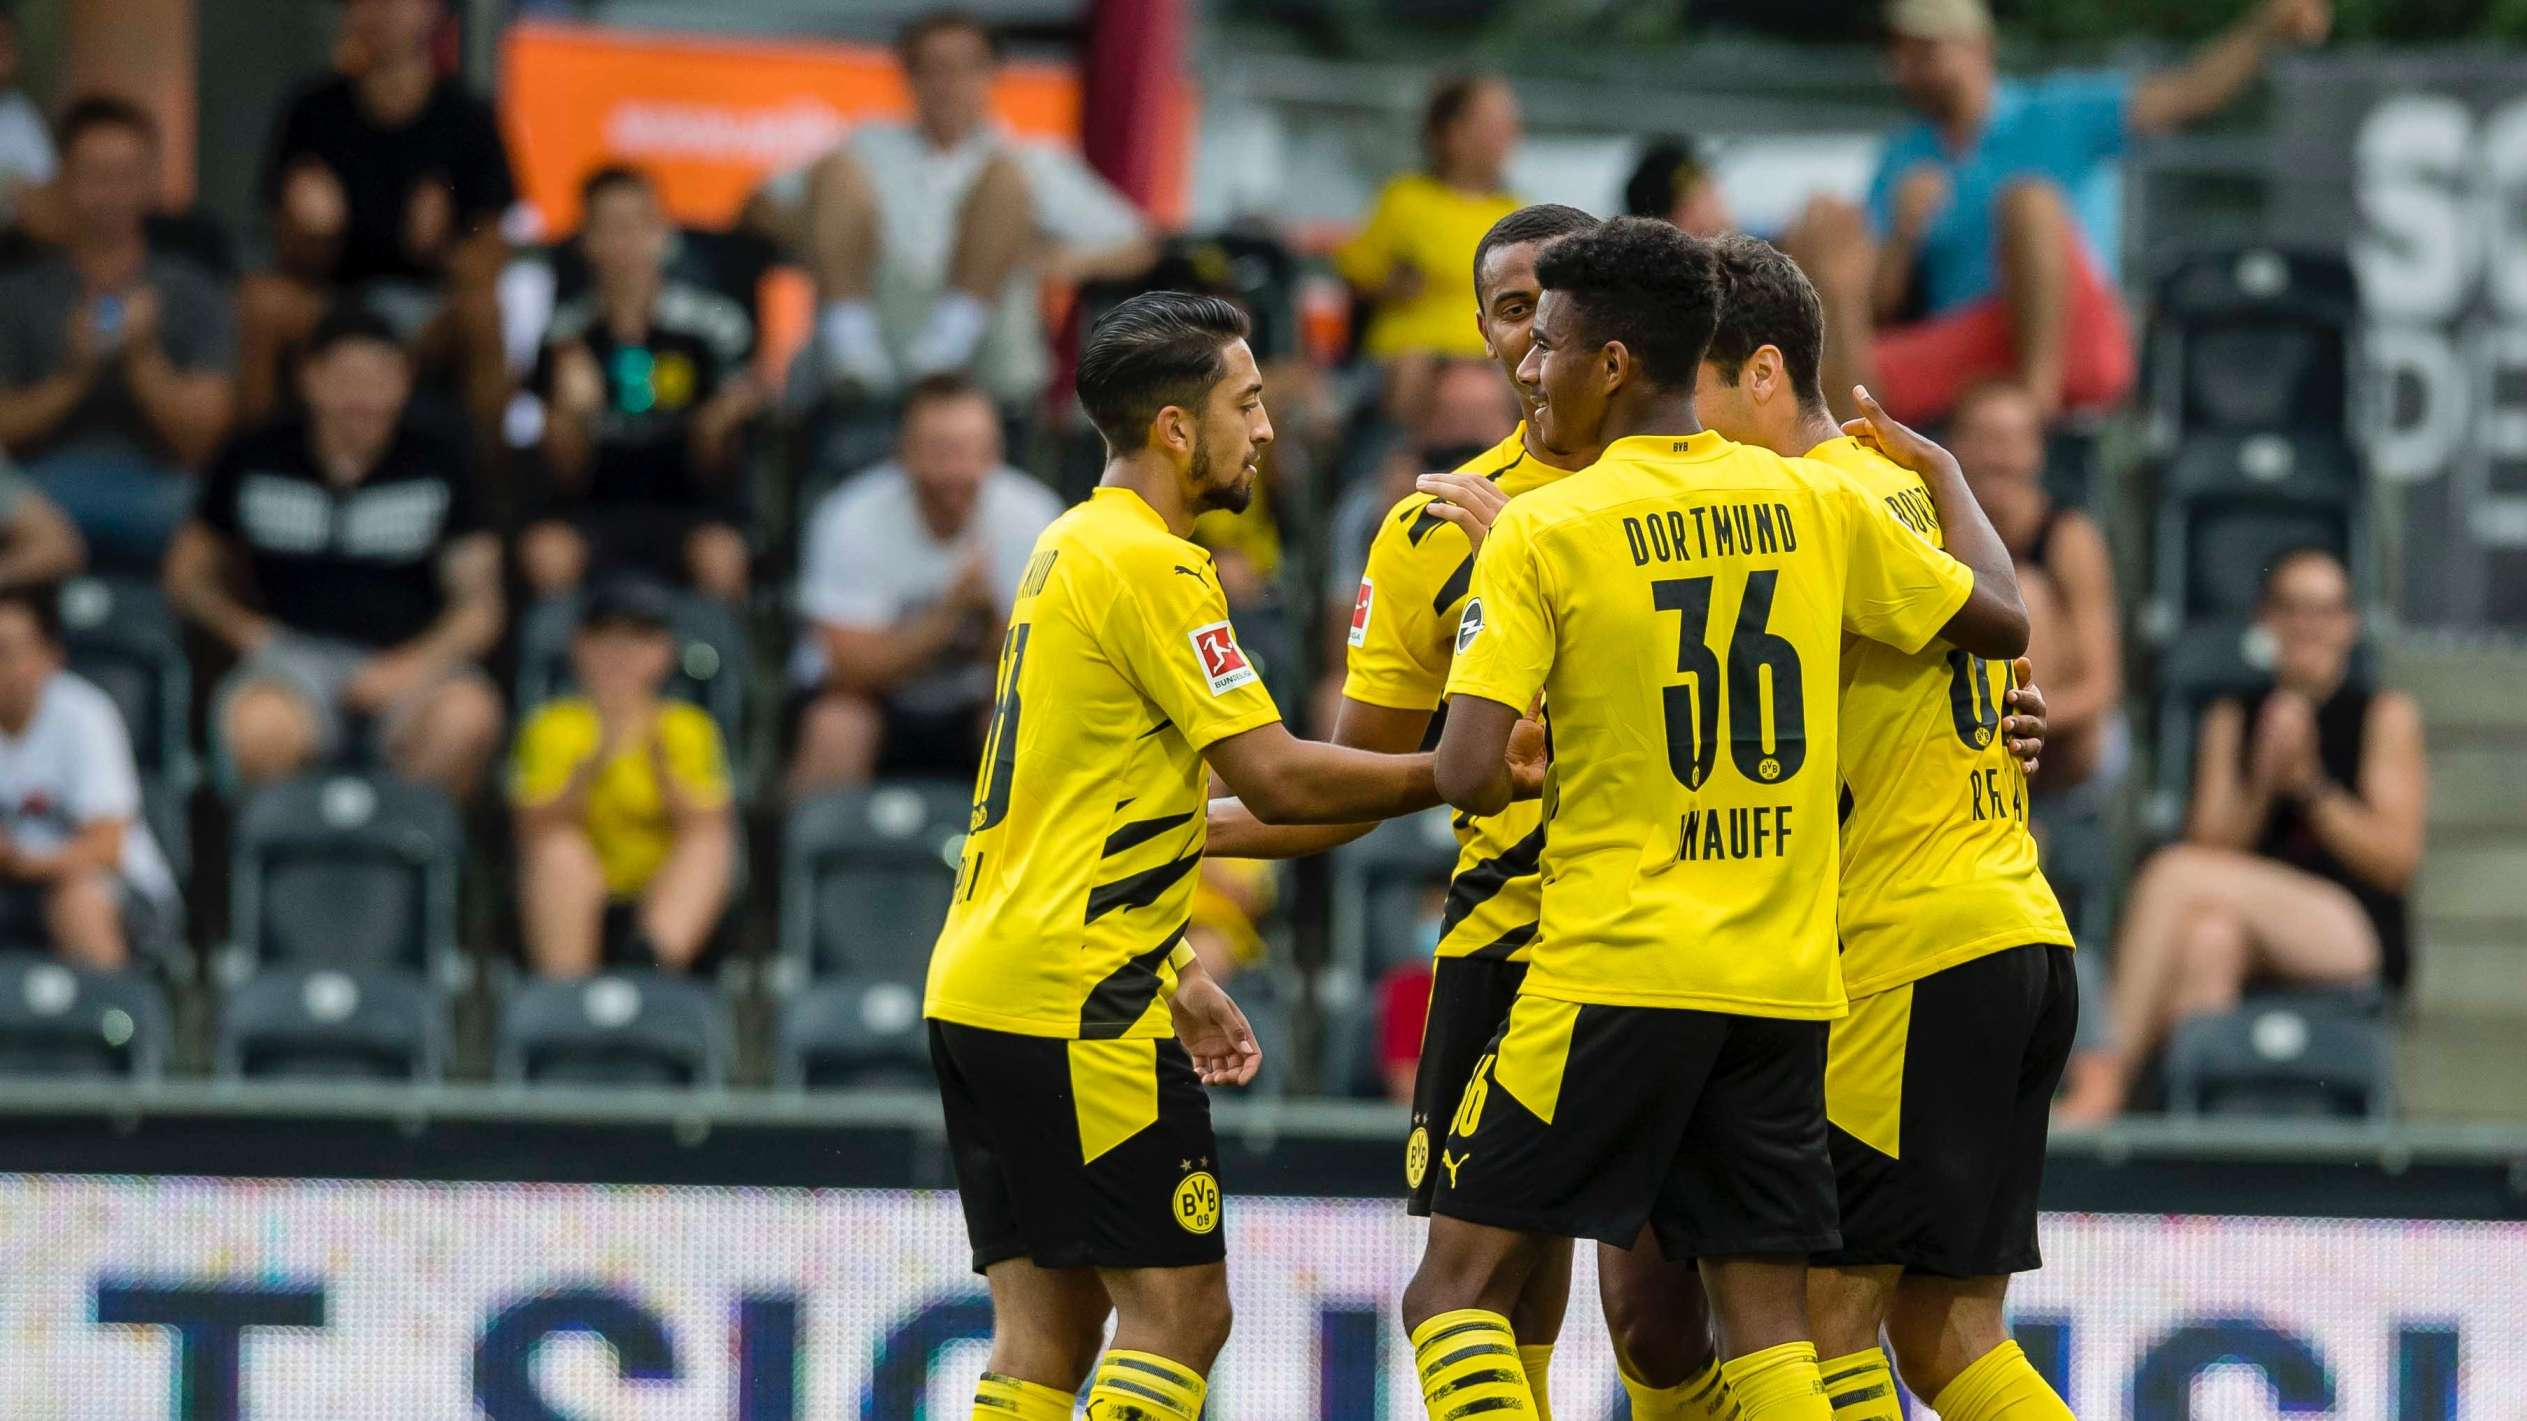 Borussia Dortmund 2020/21